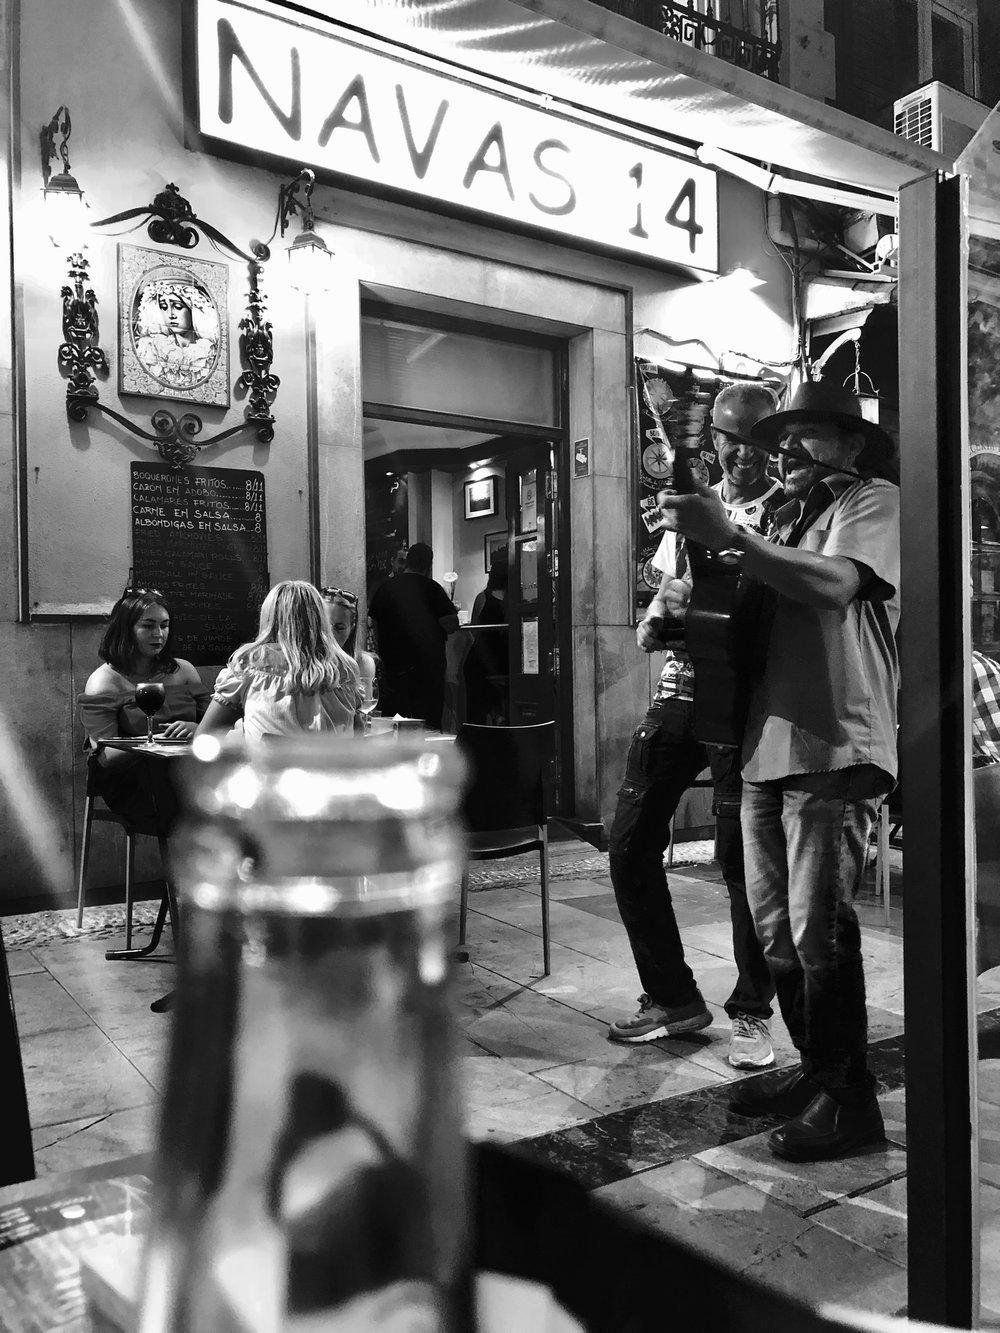 44_Elena_Cavallaro_Bullejos_Photo_3_Between the streets of Granada.jpg